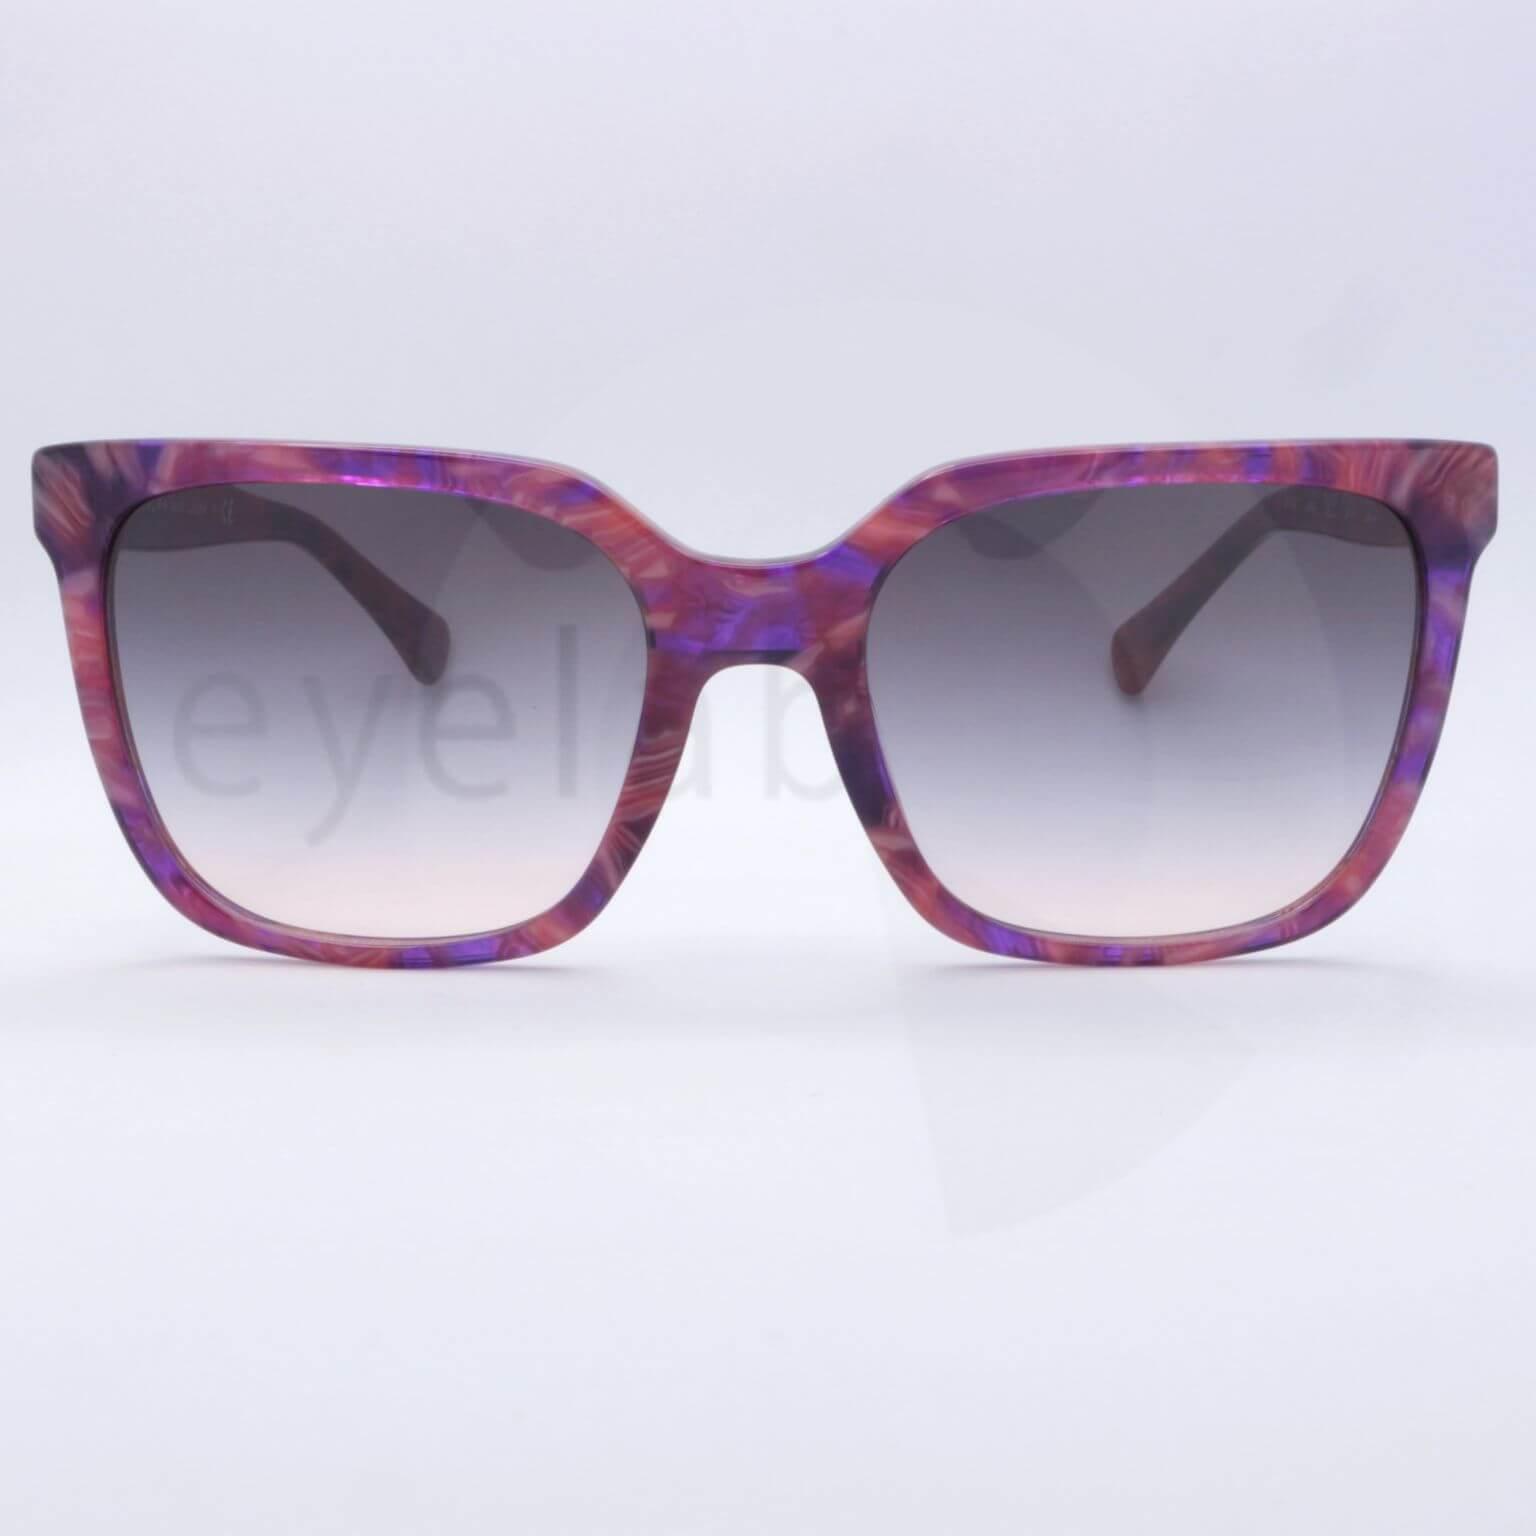 fa13ae019f Γυαλιά ηλίου Ralph by Ralph Lauren 5251 573936 ~ Eyelab